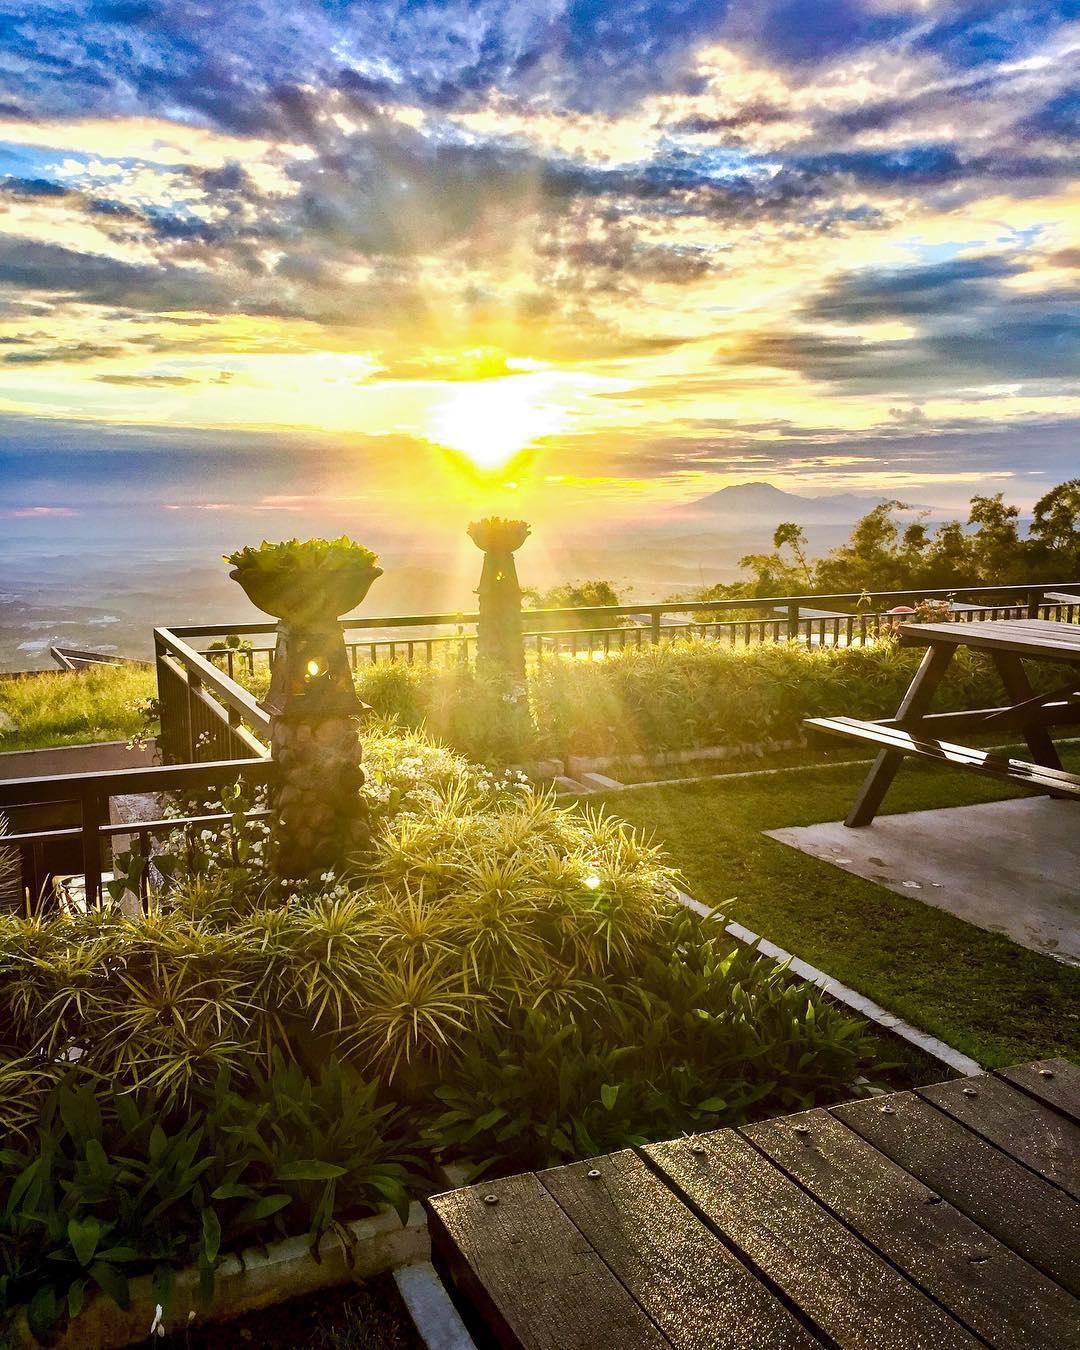 Umbul Sidomukti Resort Harga